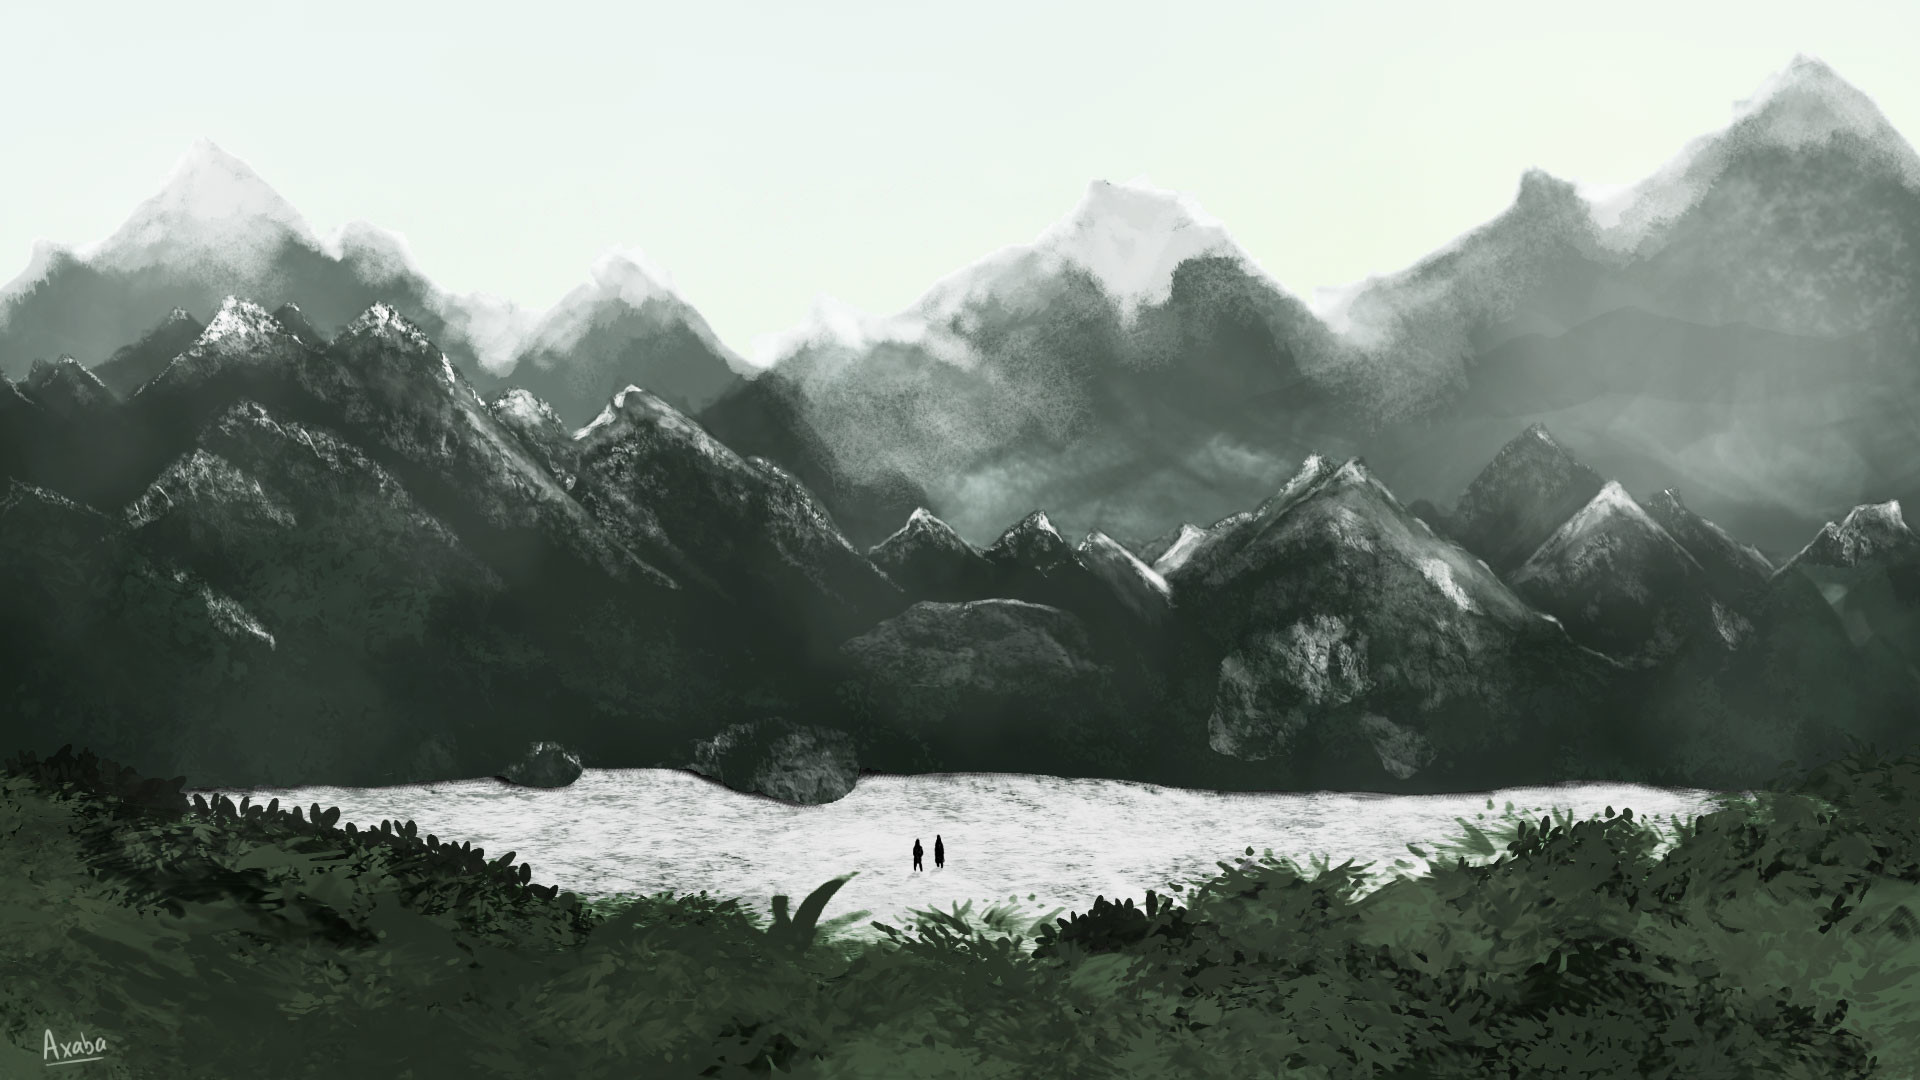 Natacha lefevre paysage montagne